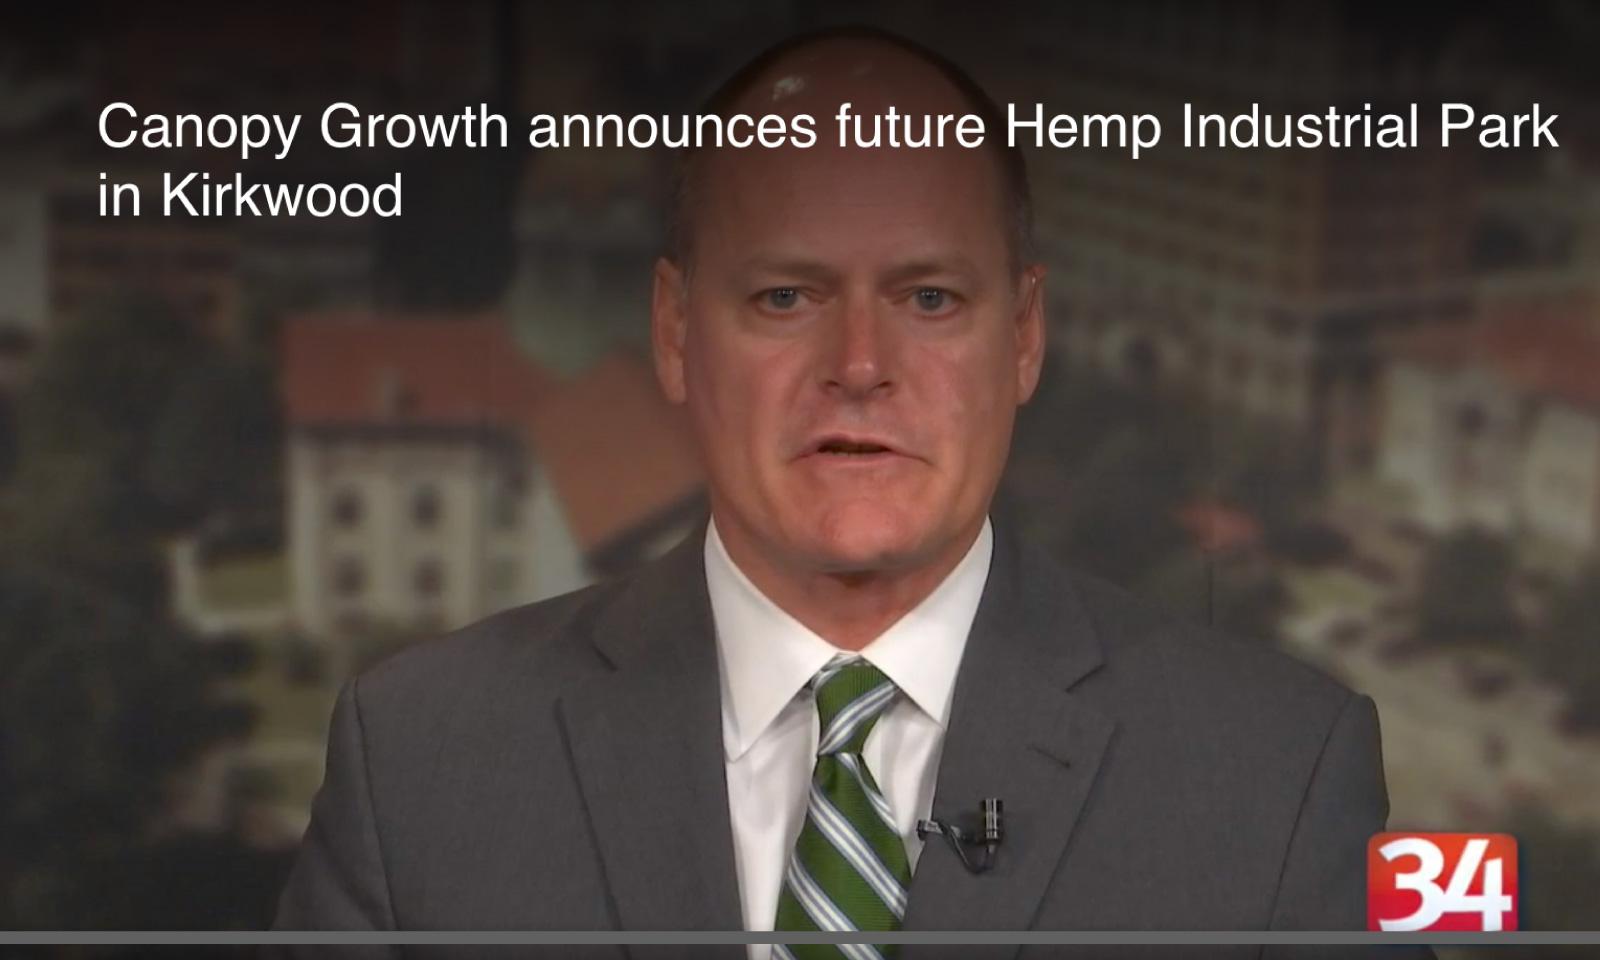 Canopy Growth announces future Hemp Industrial Park in Kirkwood NEWS